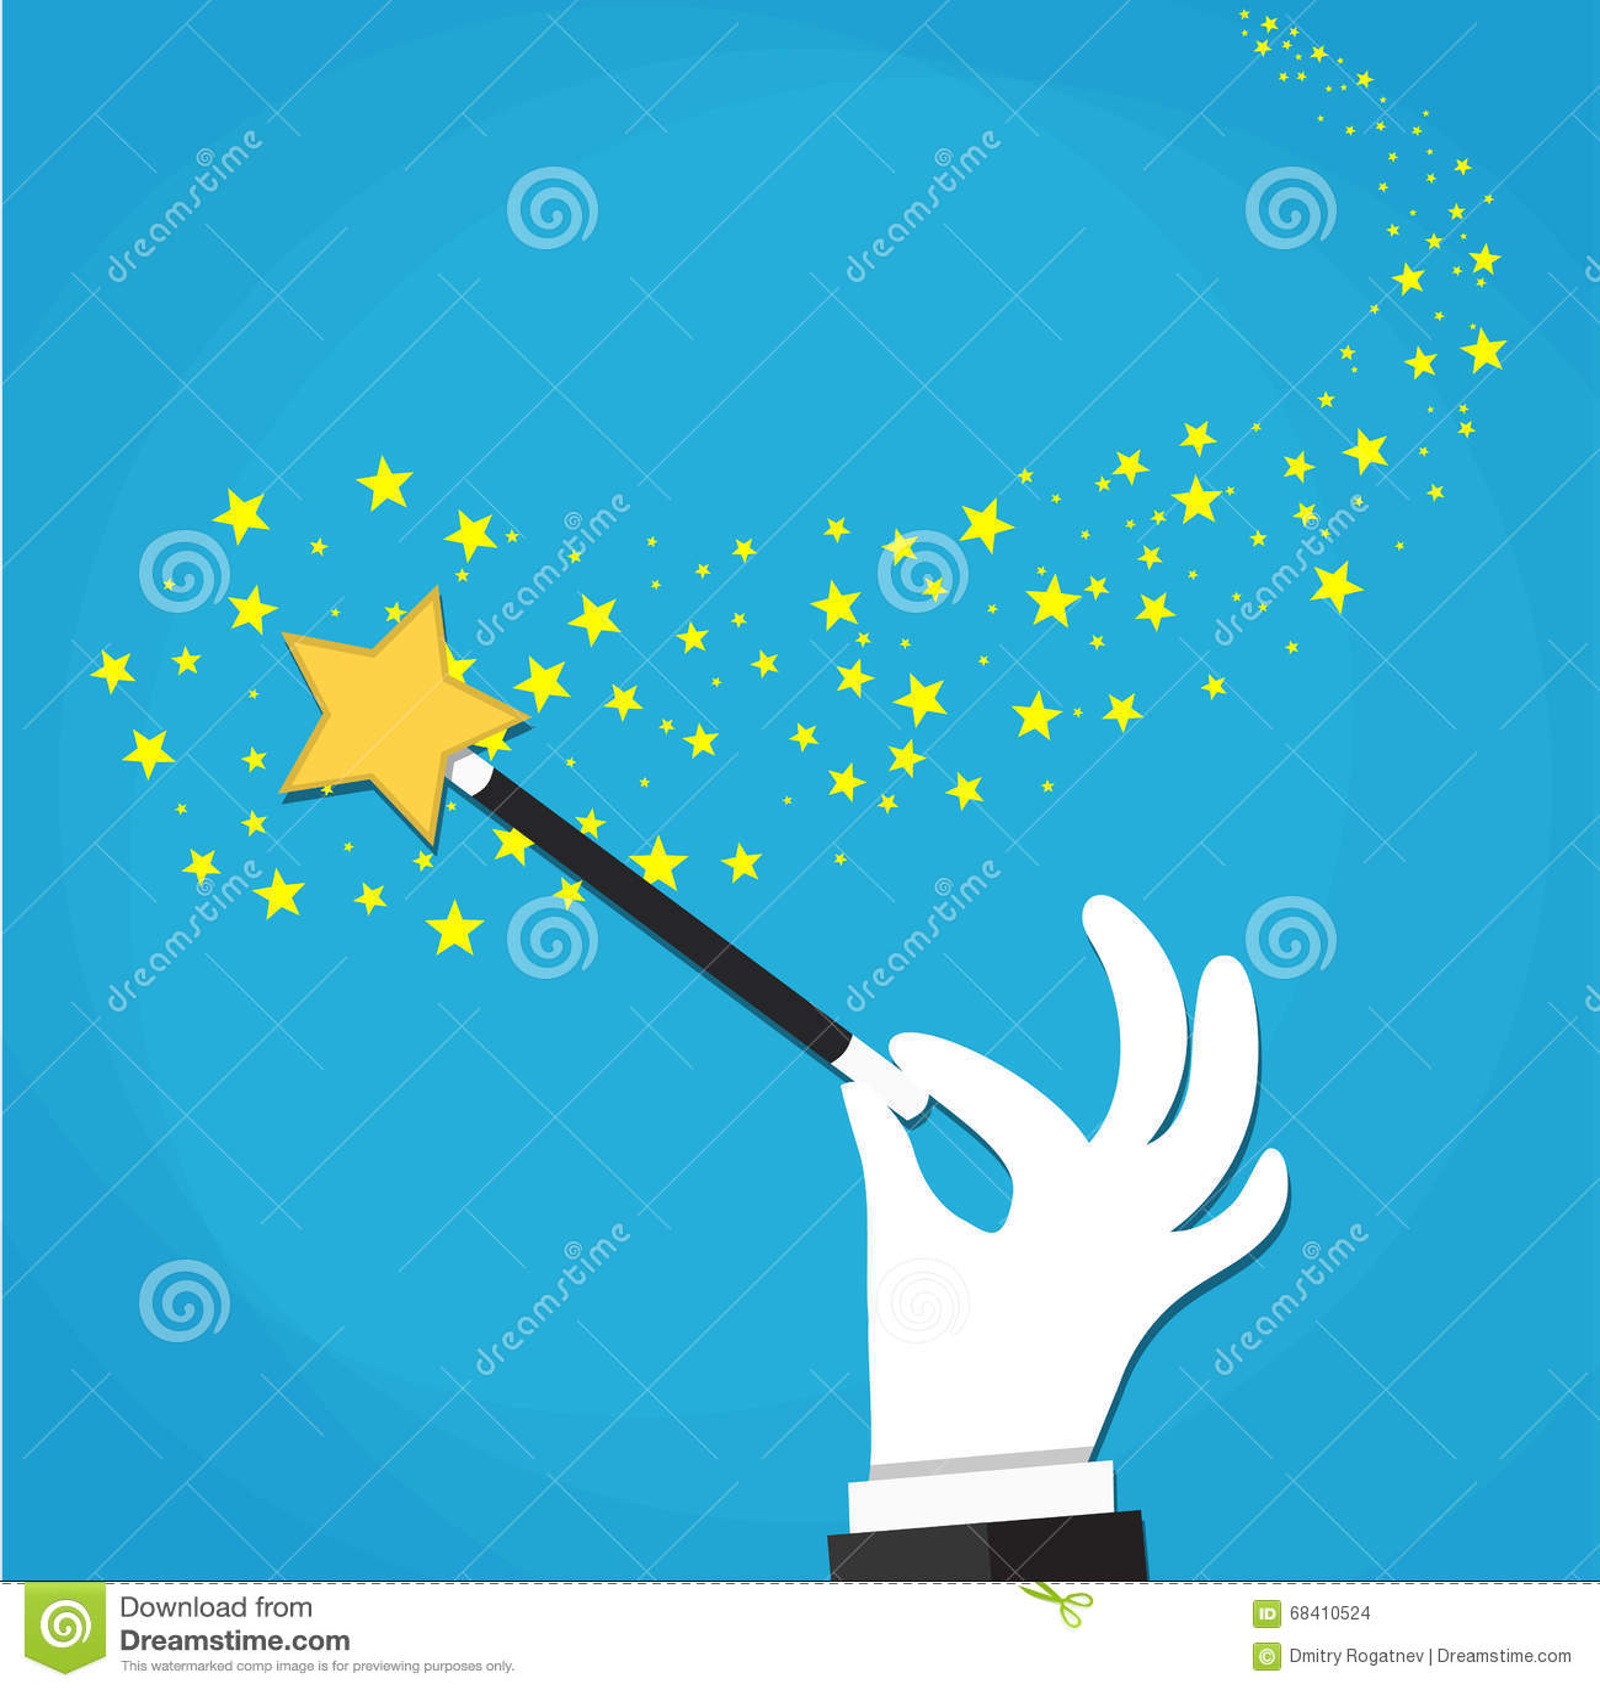 Cartoon Hand Hold Magic Wand With Stars Sparks. Stock Vector ...